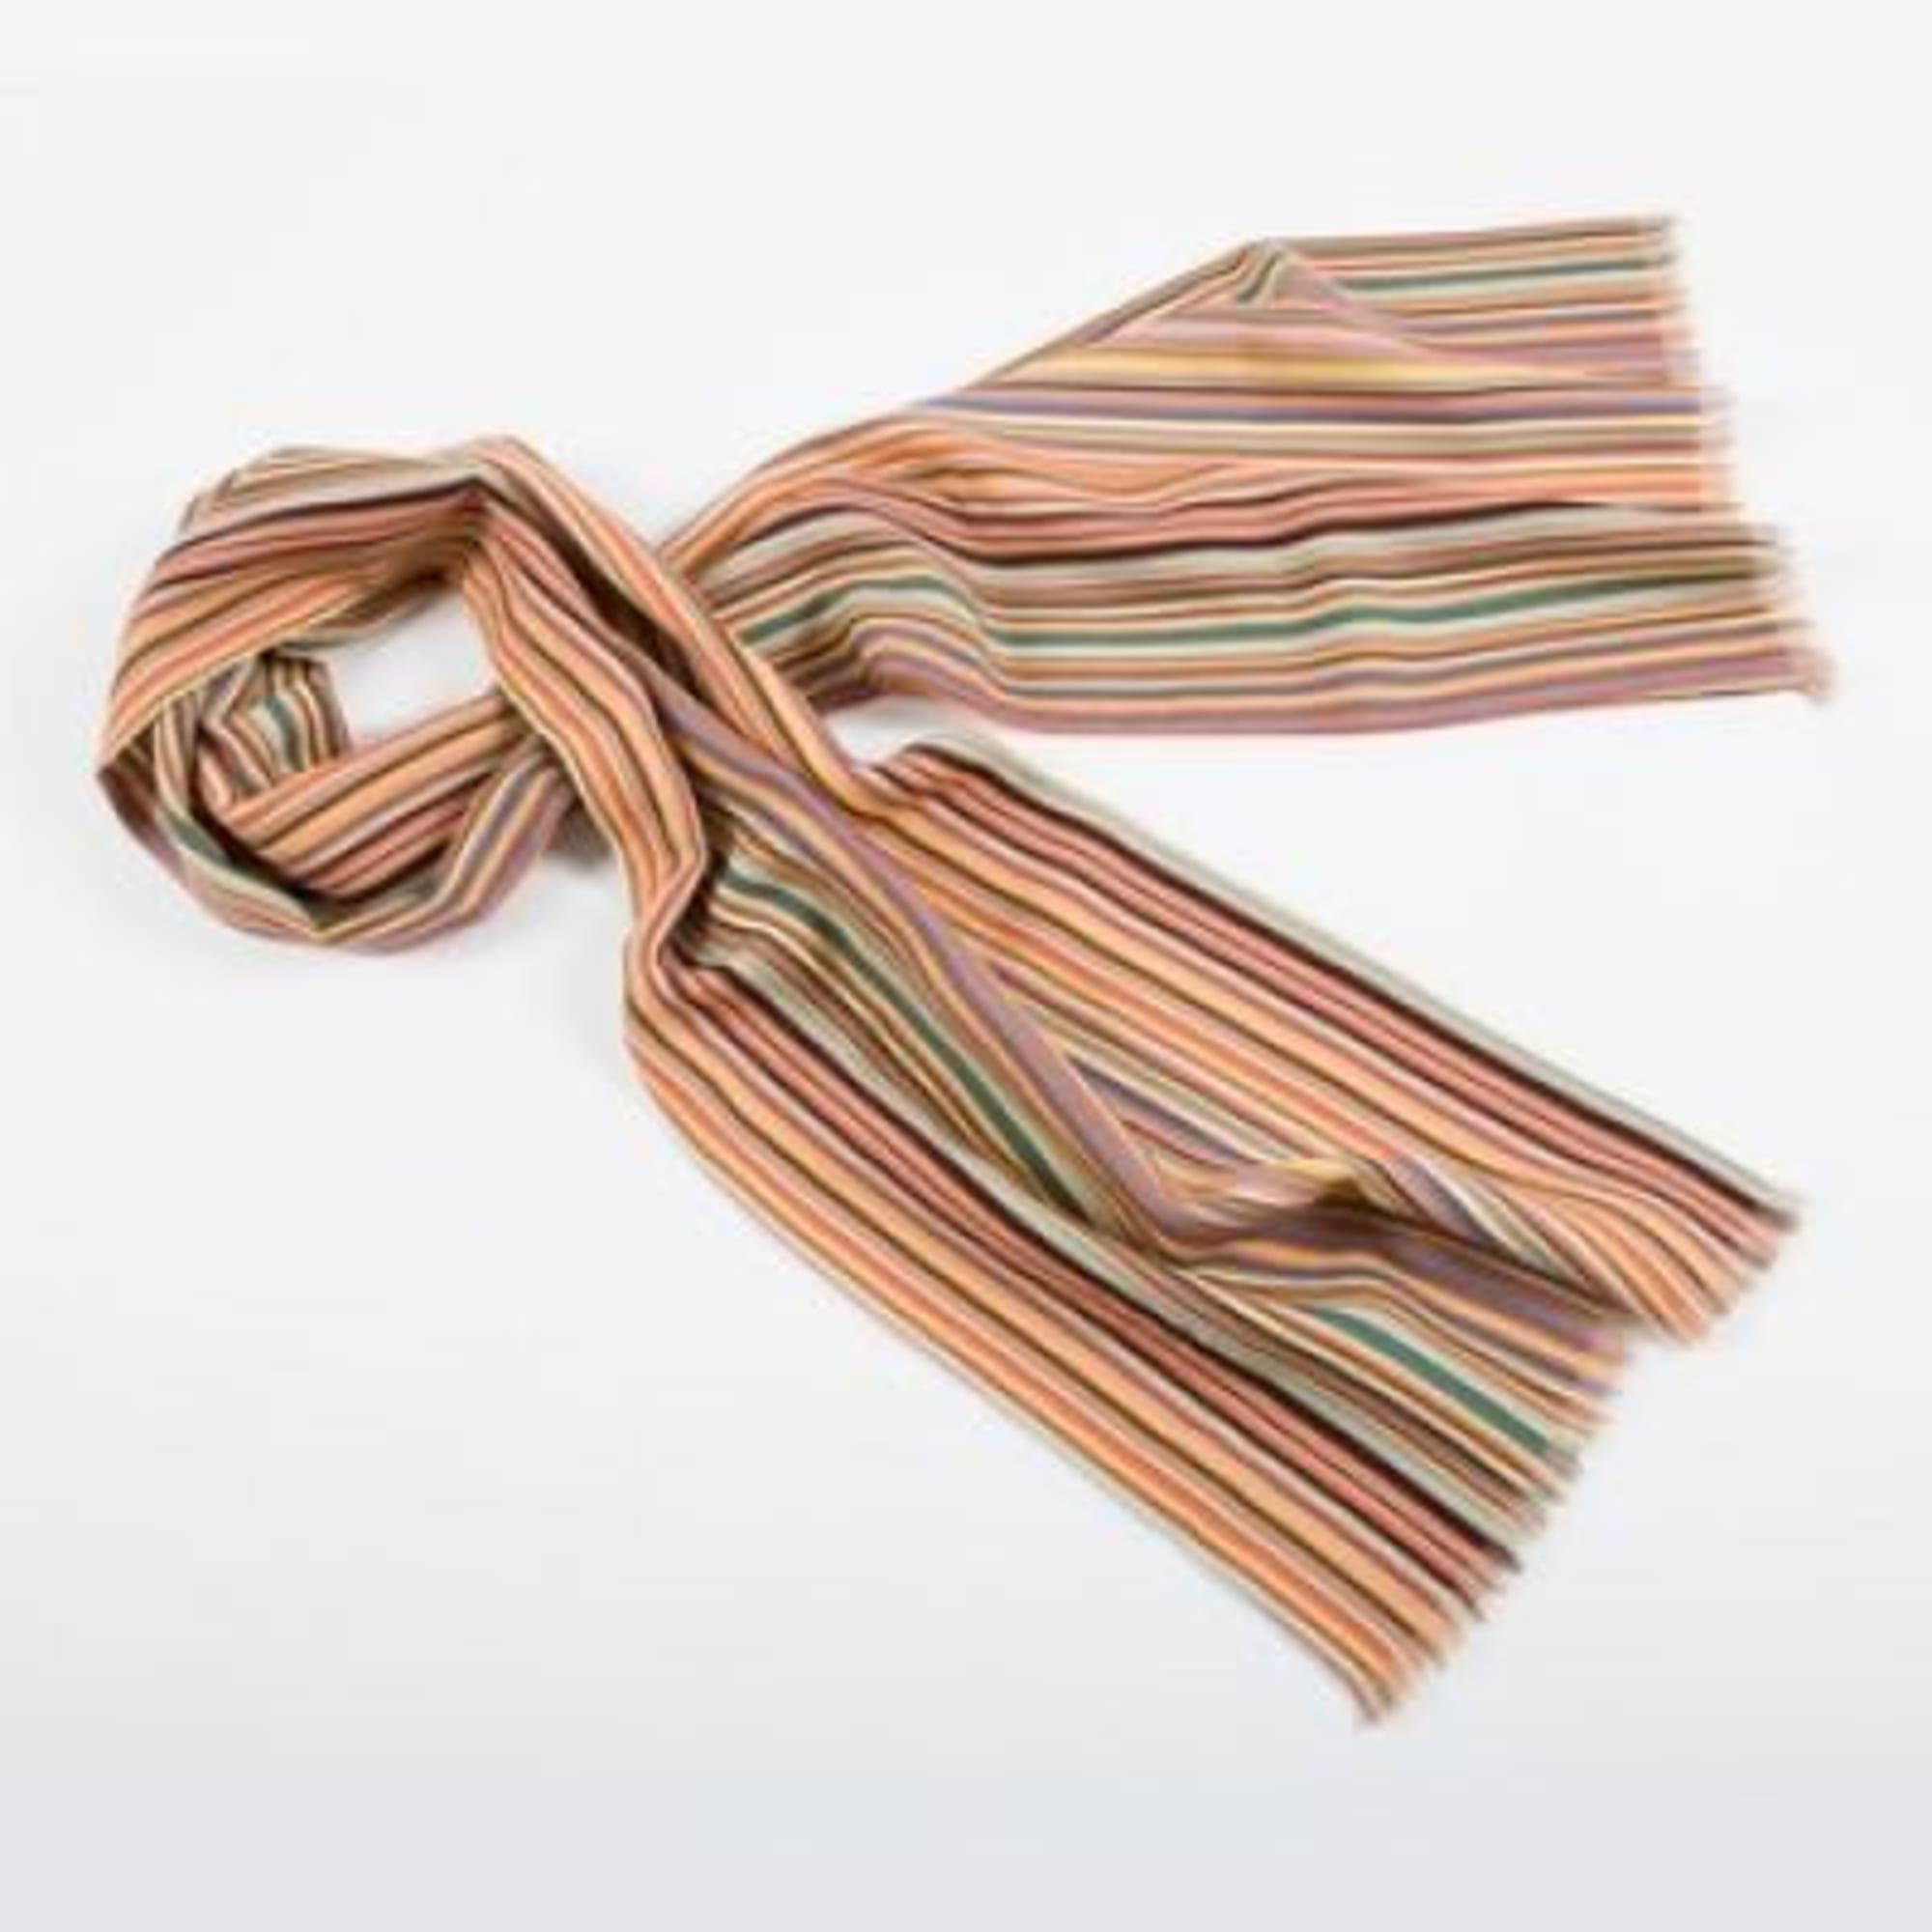 Echarpe PAUL SMITH multicolore vendu par Maxime 63488713 - 2505431 2bd322e9fb7